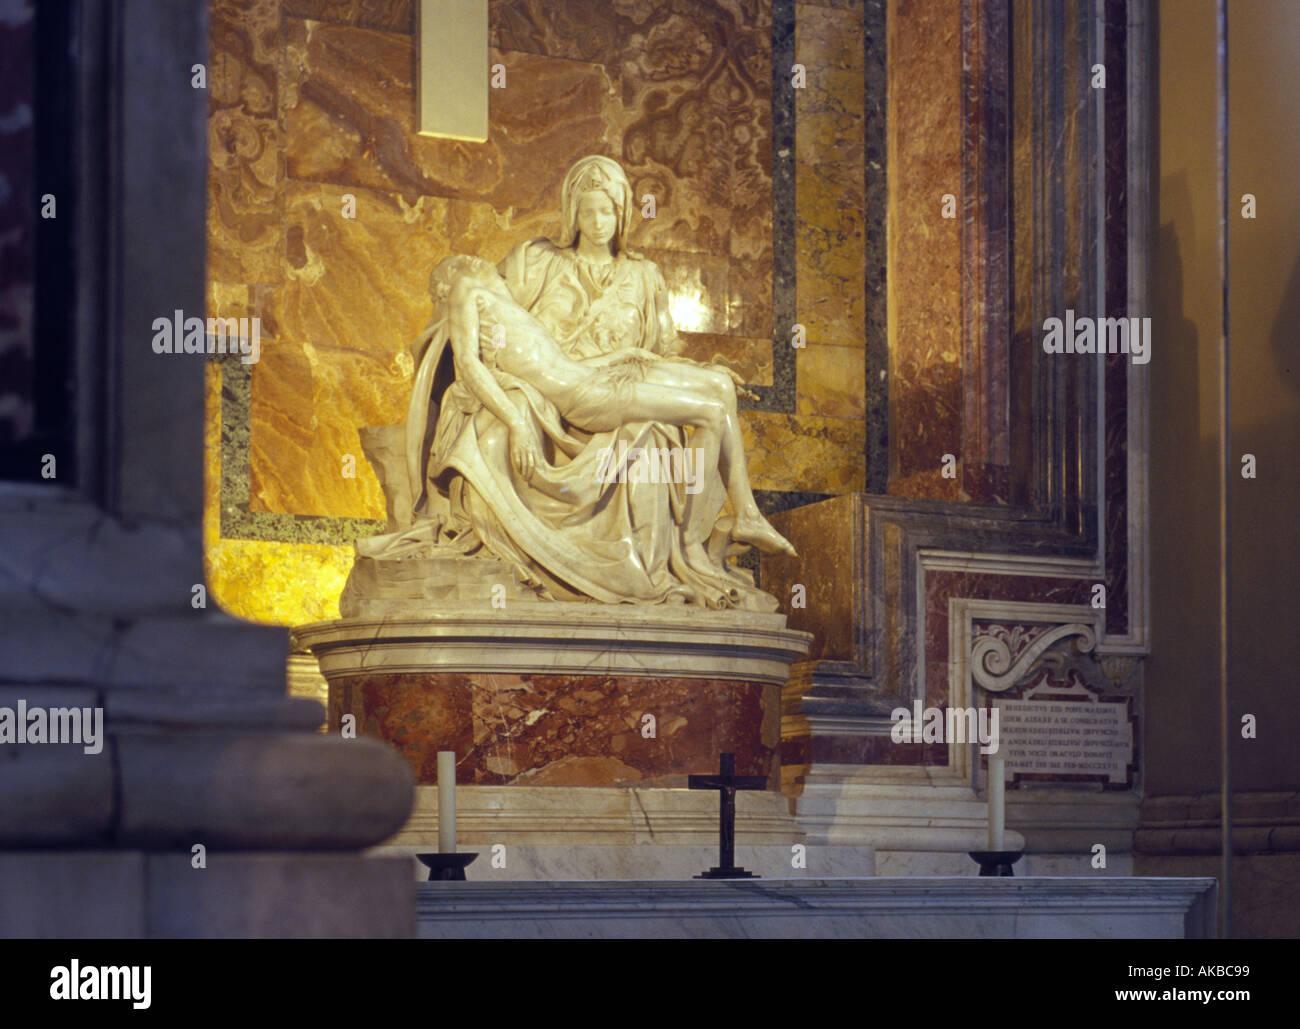 Michelangelo s Pieta in Saint Peter s Basilica in Rome Stock Photo